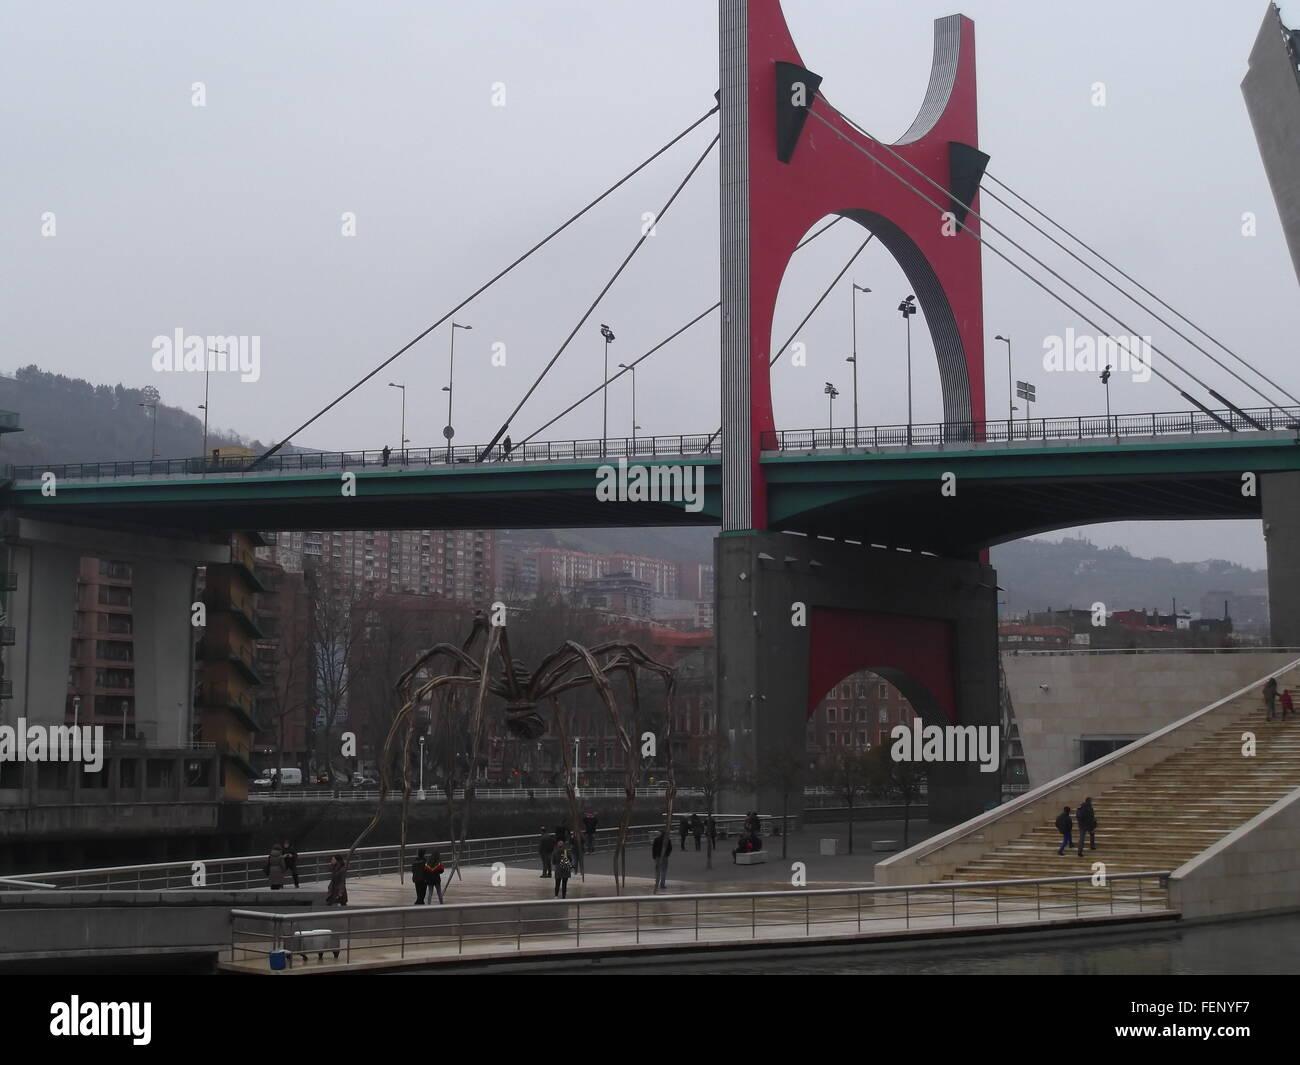 Low Angle View Of Suspension Bridge - Stock Image